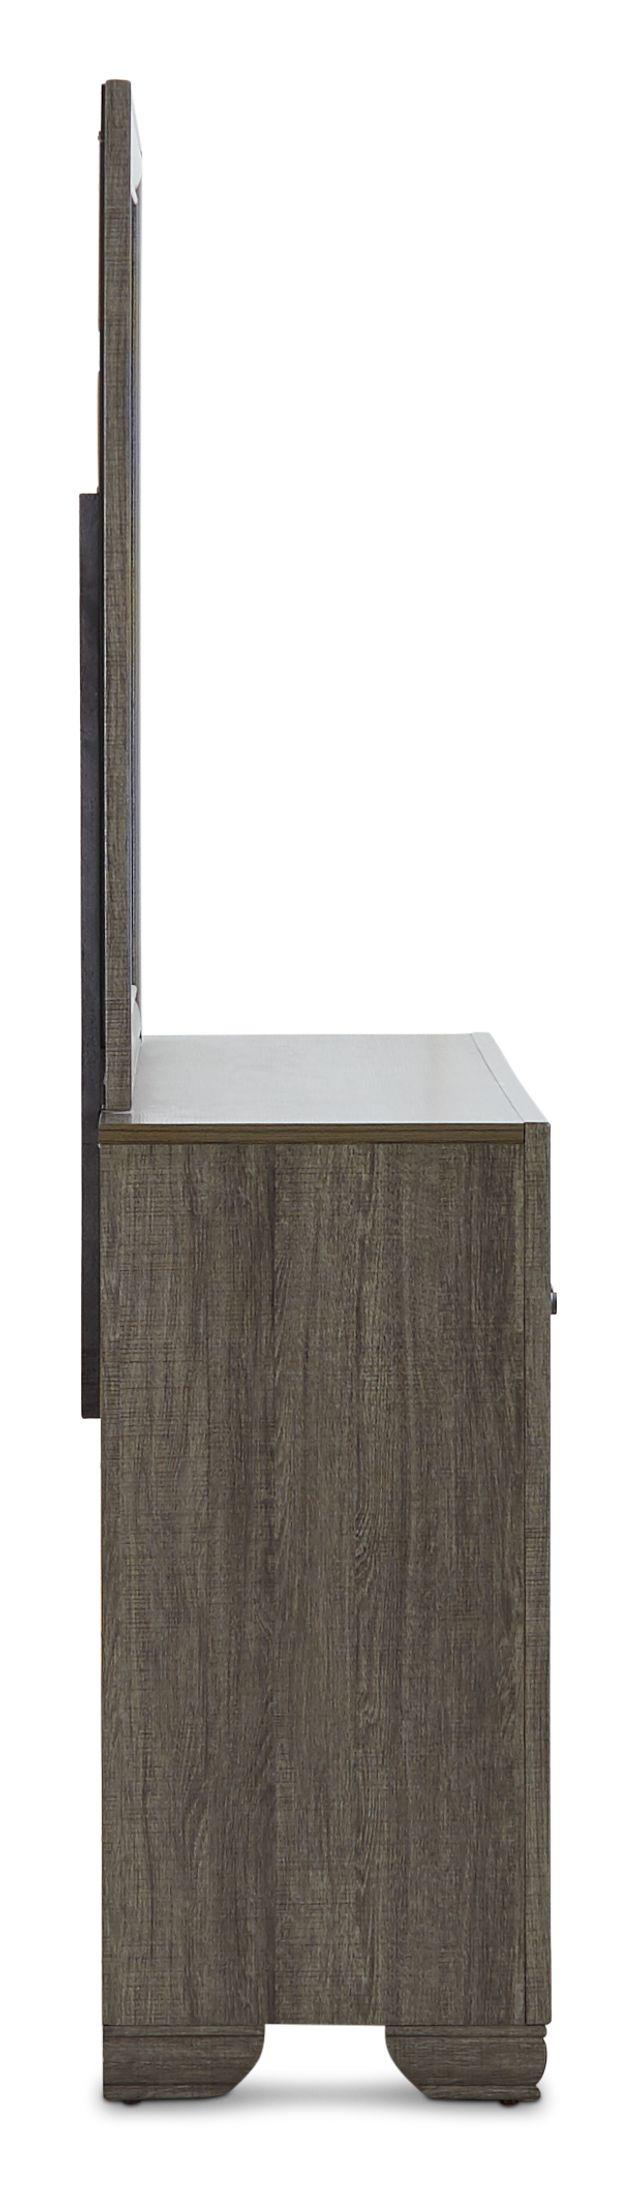 Colson Light Tone Dresser & Mirror (3)